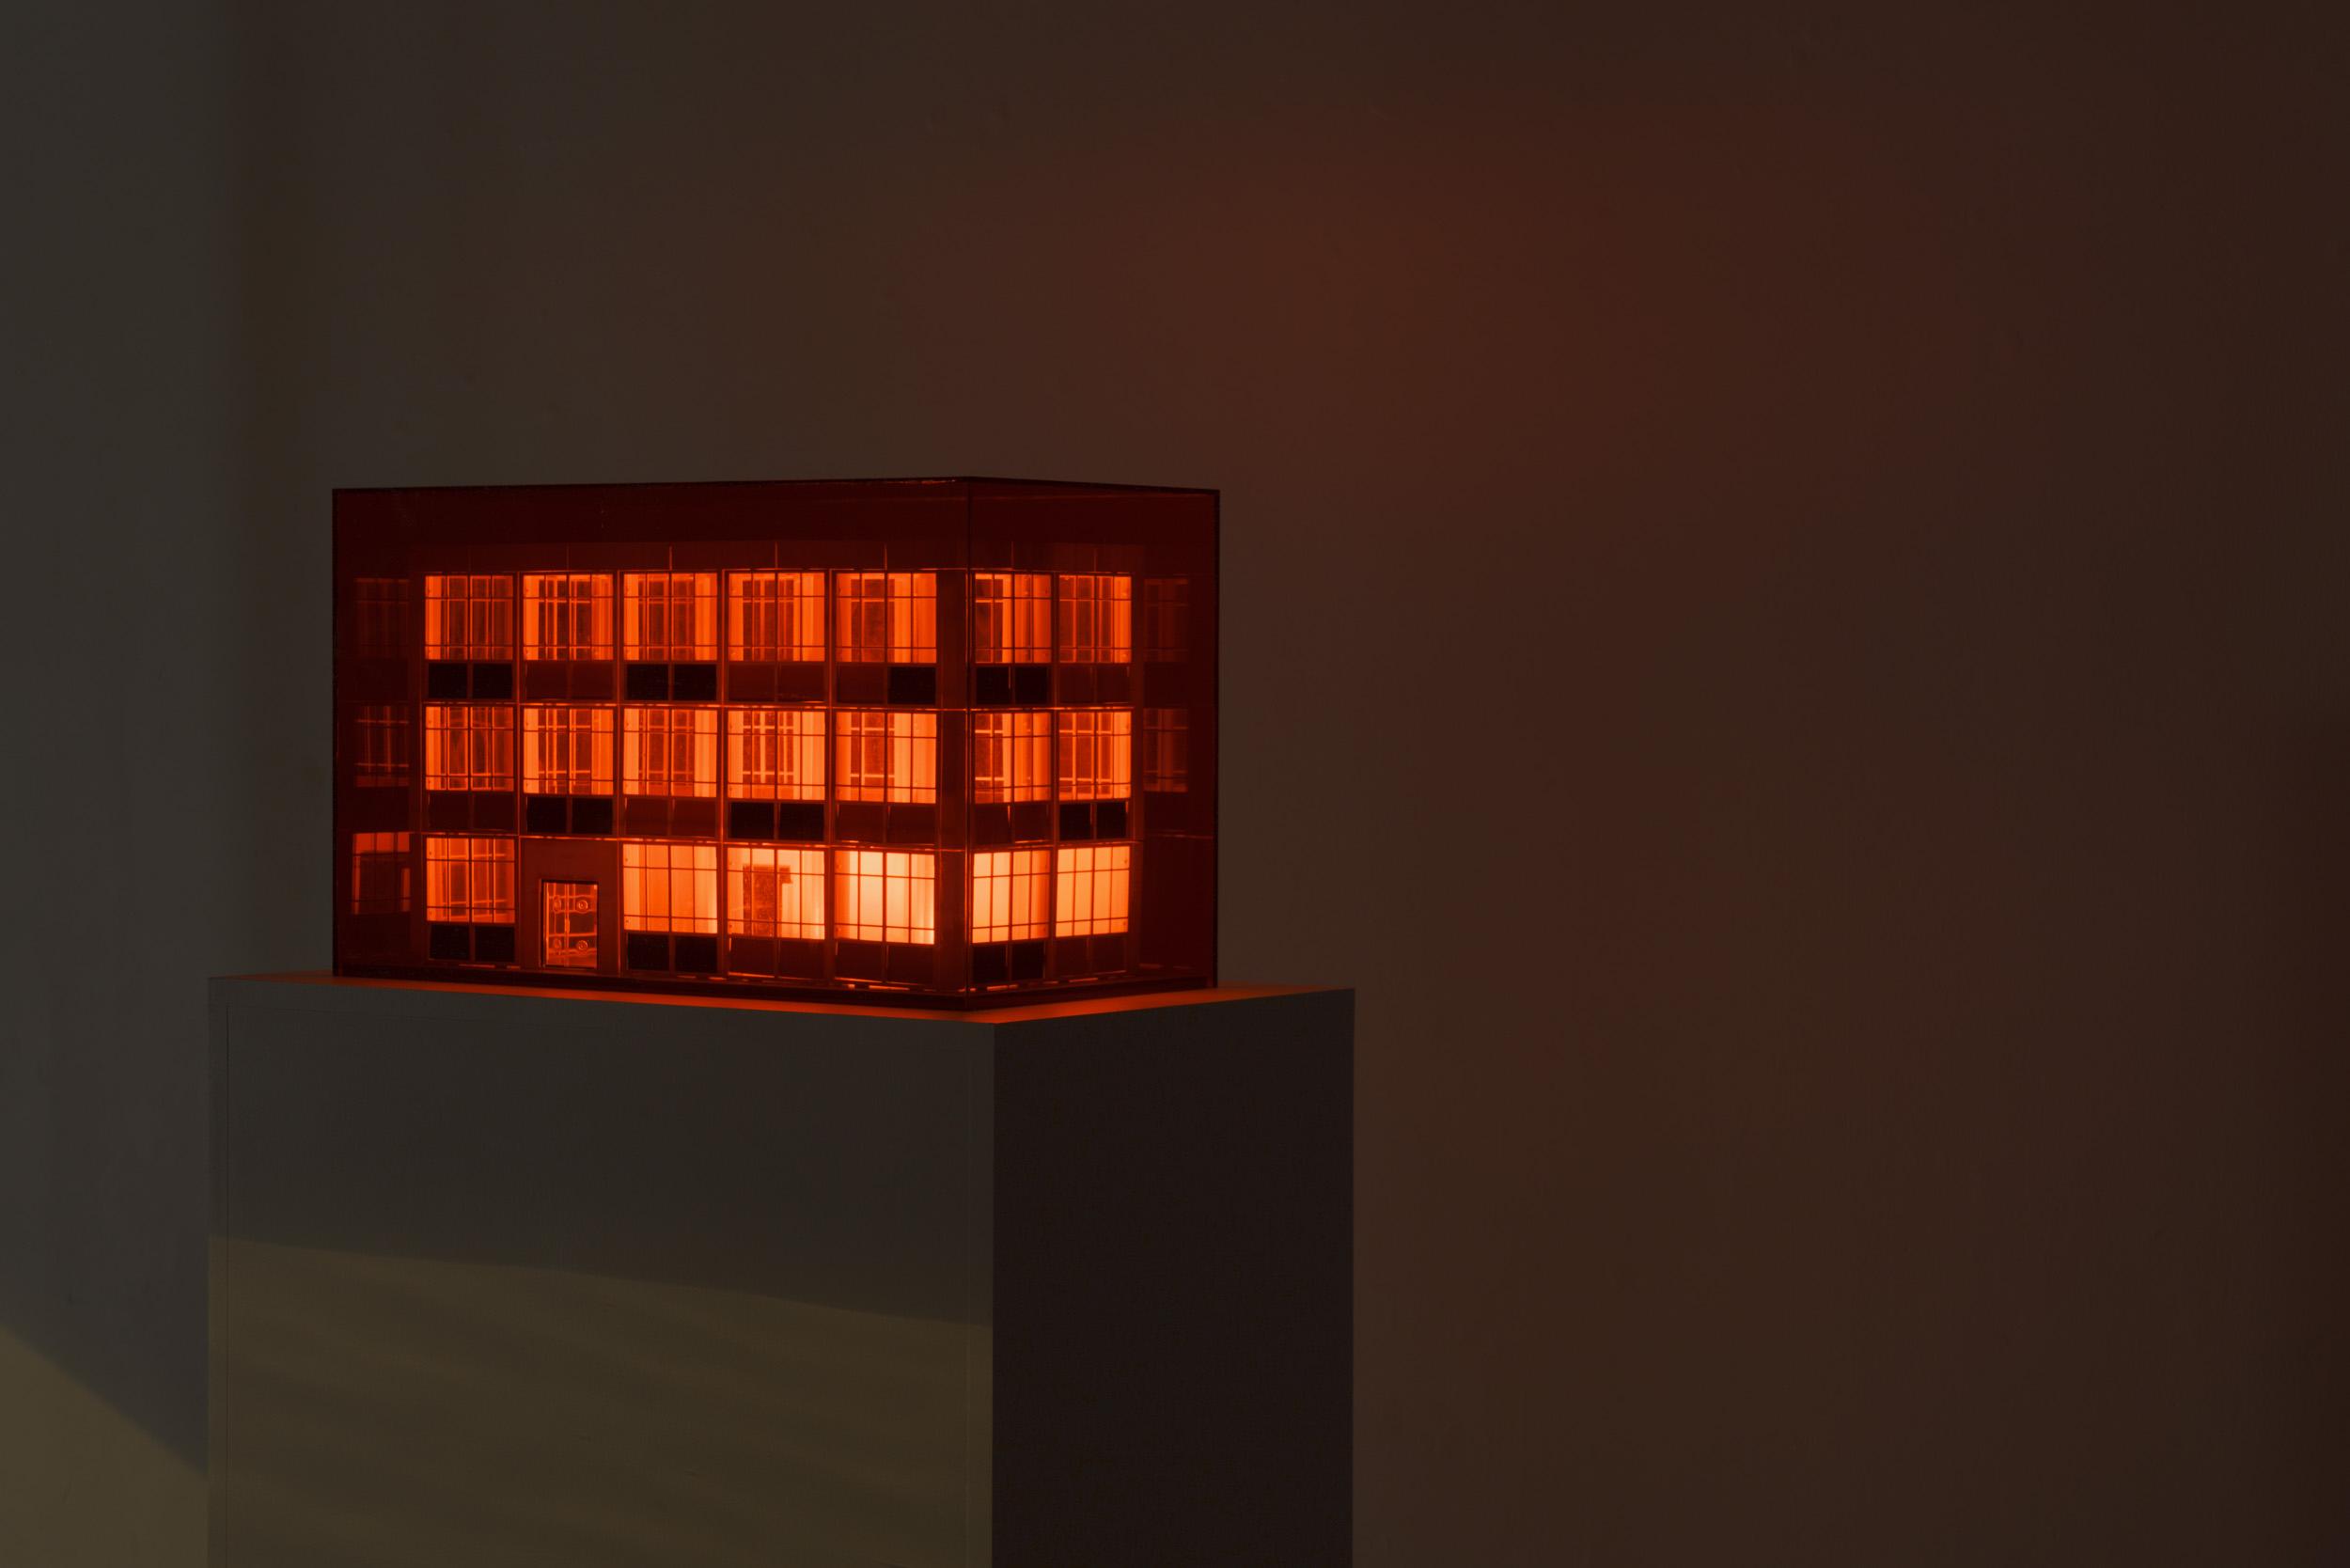 International Red Light, Model, night view